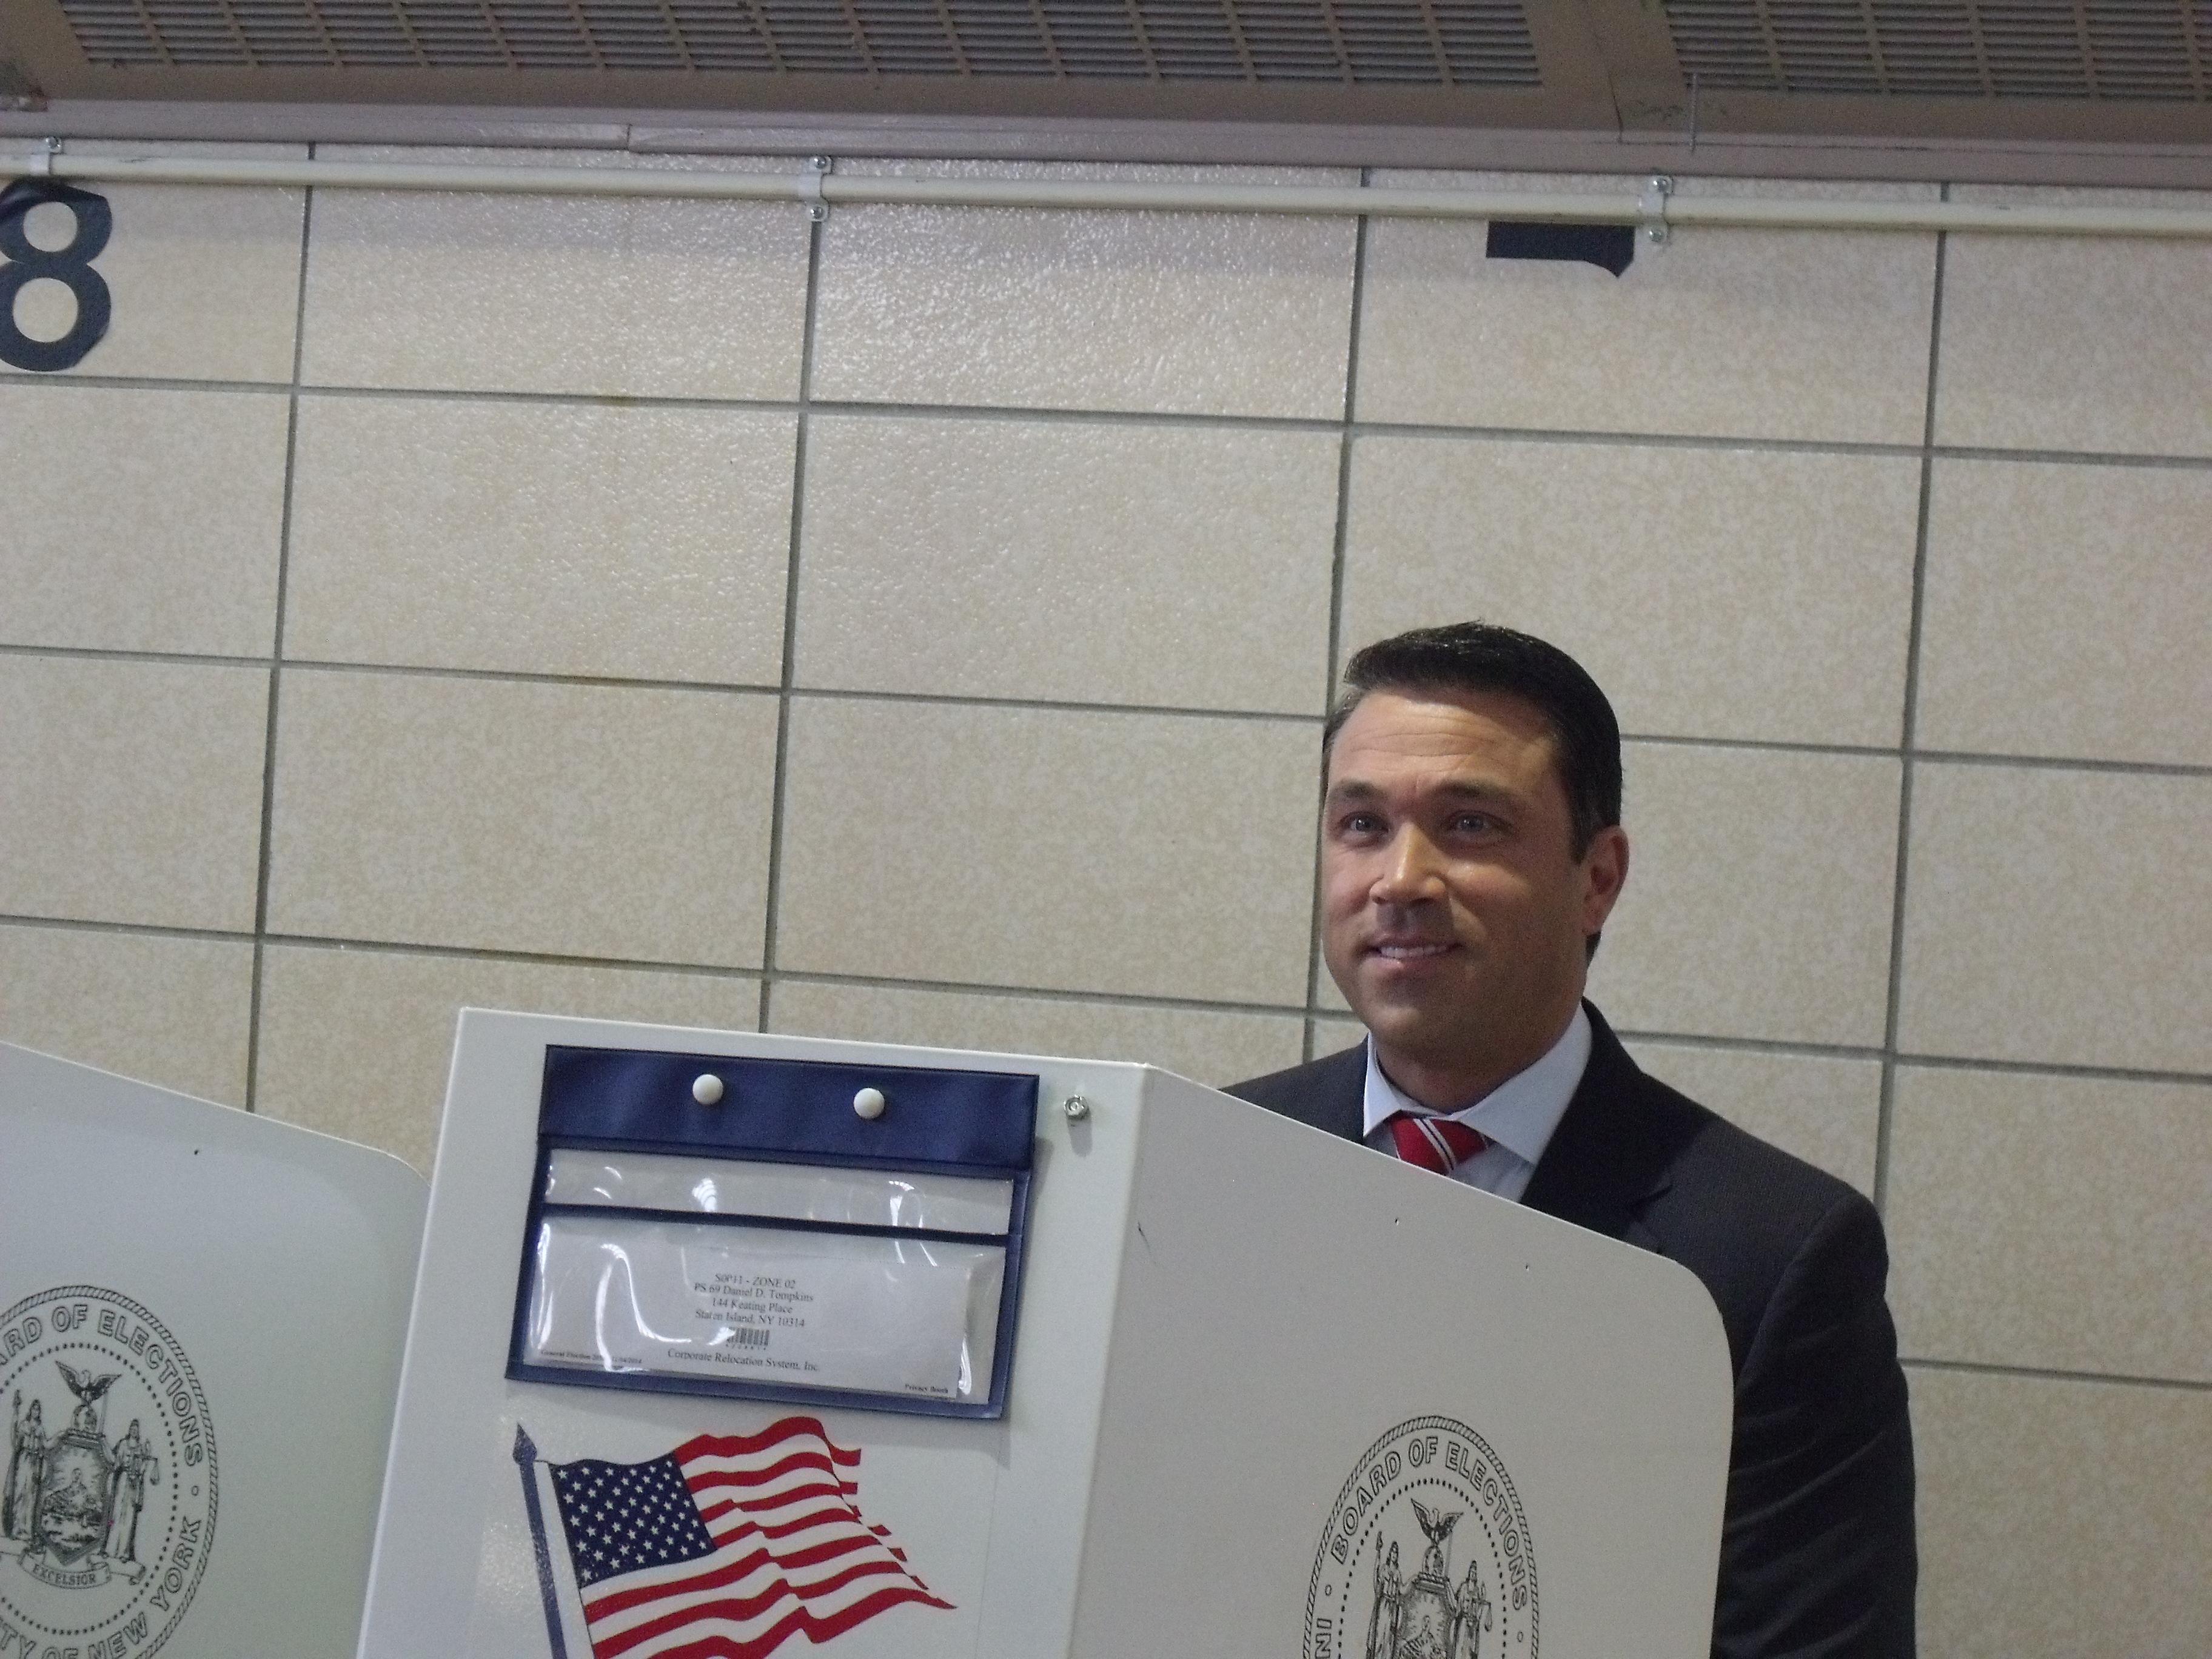 Congressman Michael Grimm casts his vote today at PS 69 on Staten Island. (Photo: Jillian Jorgensen)